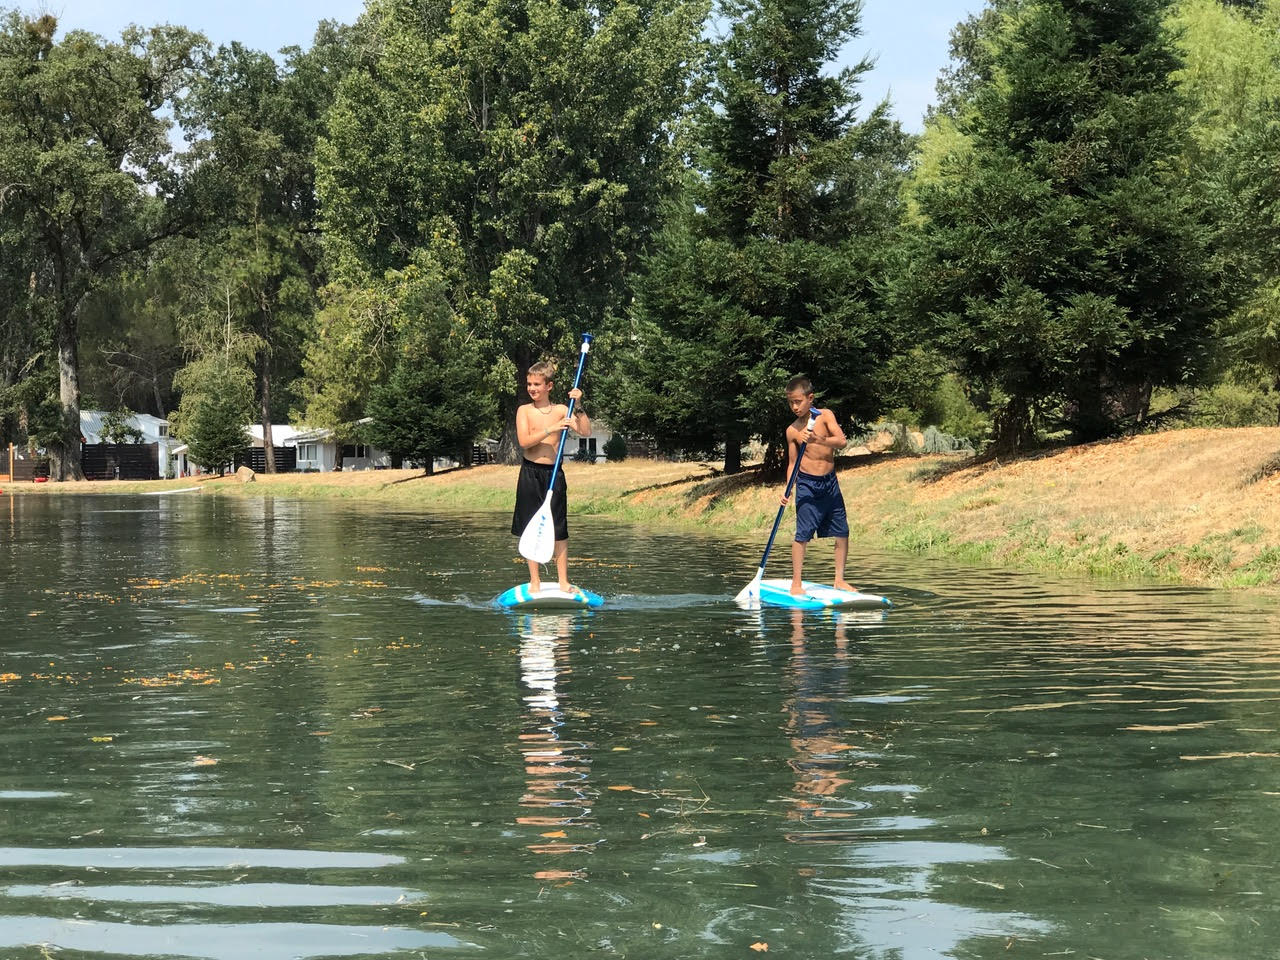 paddleboarding_pond.jpg